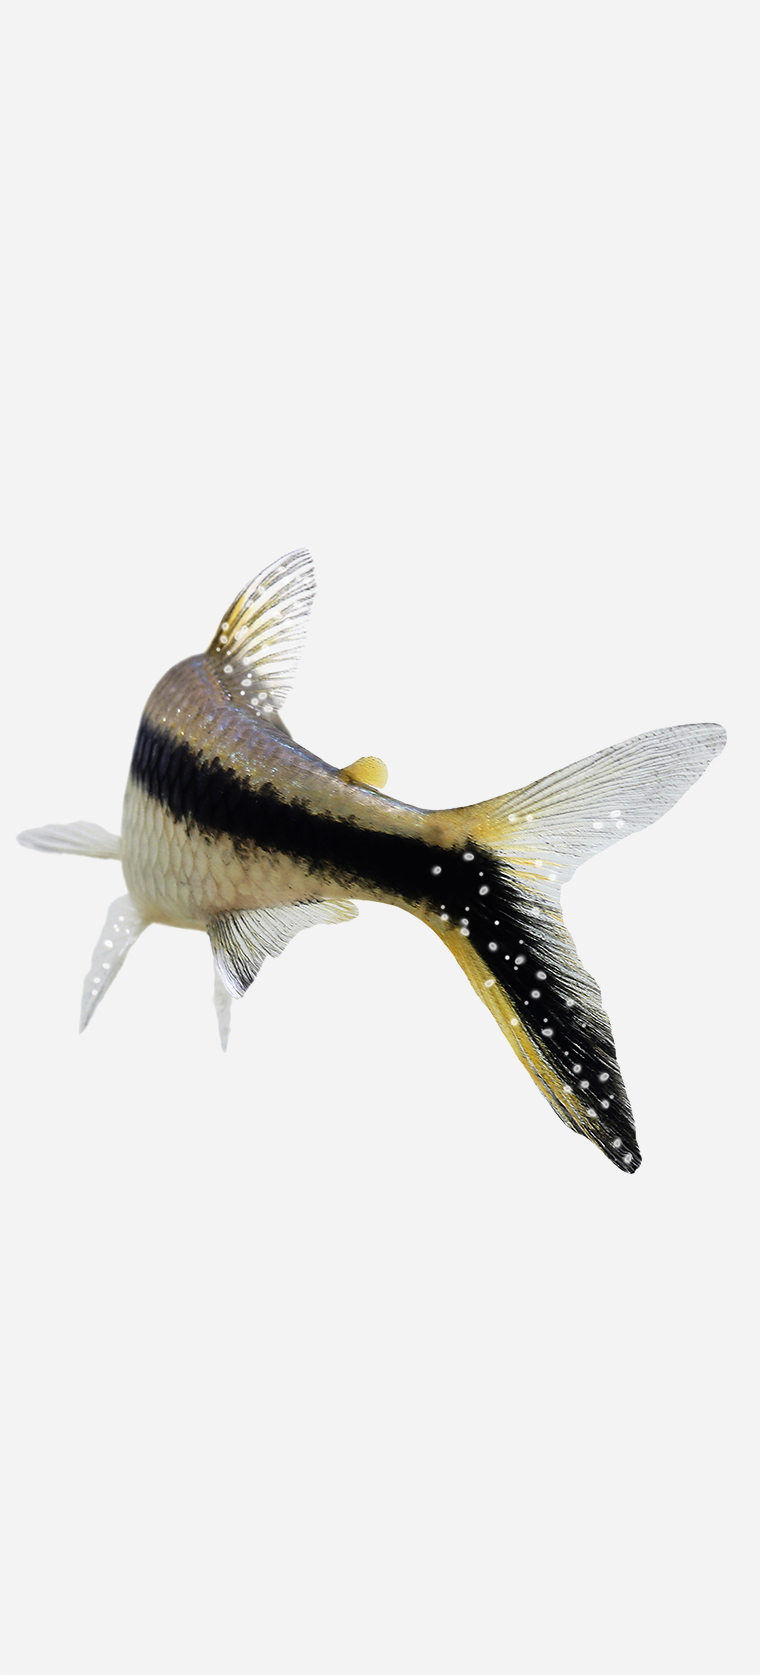 Fish aquarium white spots - Black Yellow And Silver Aquarium Fish With Salt Like White Specs Across It